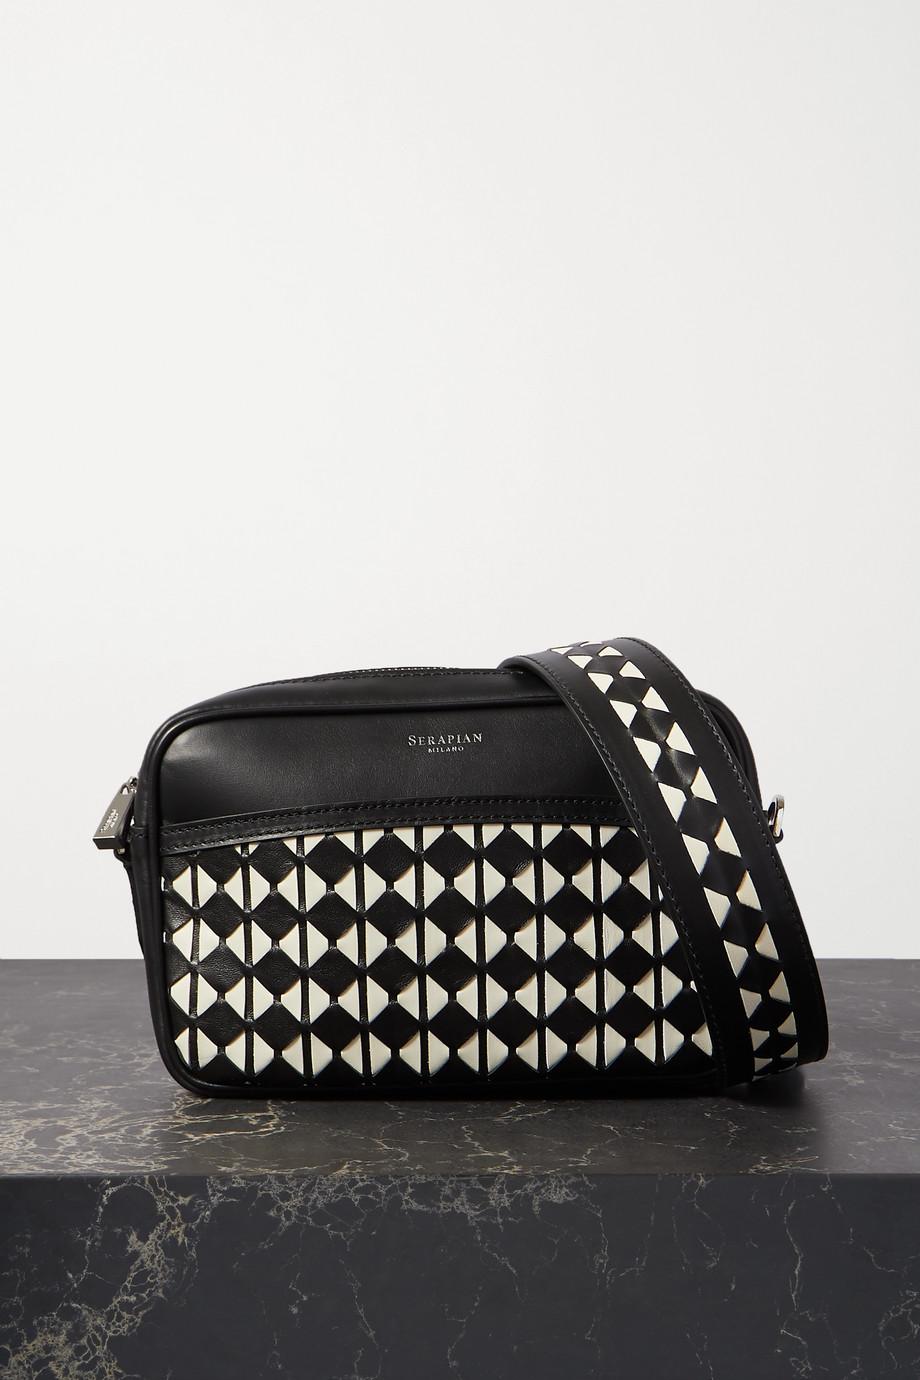 Serapian Two-tone woven leather shoulder bag